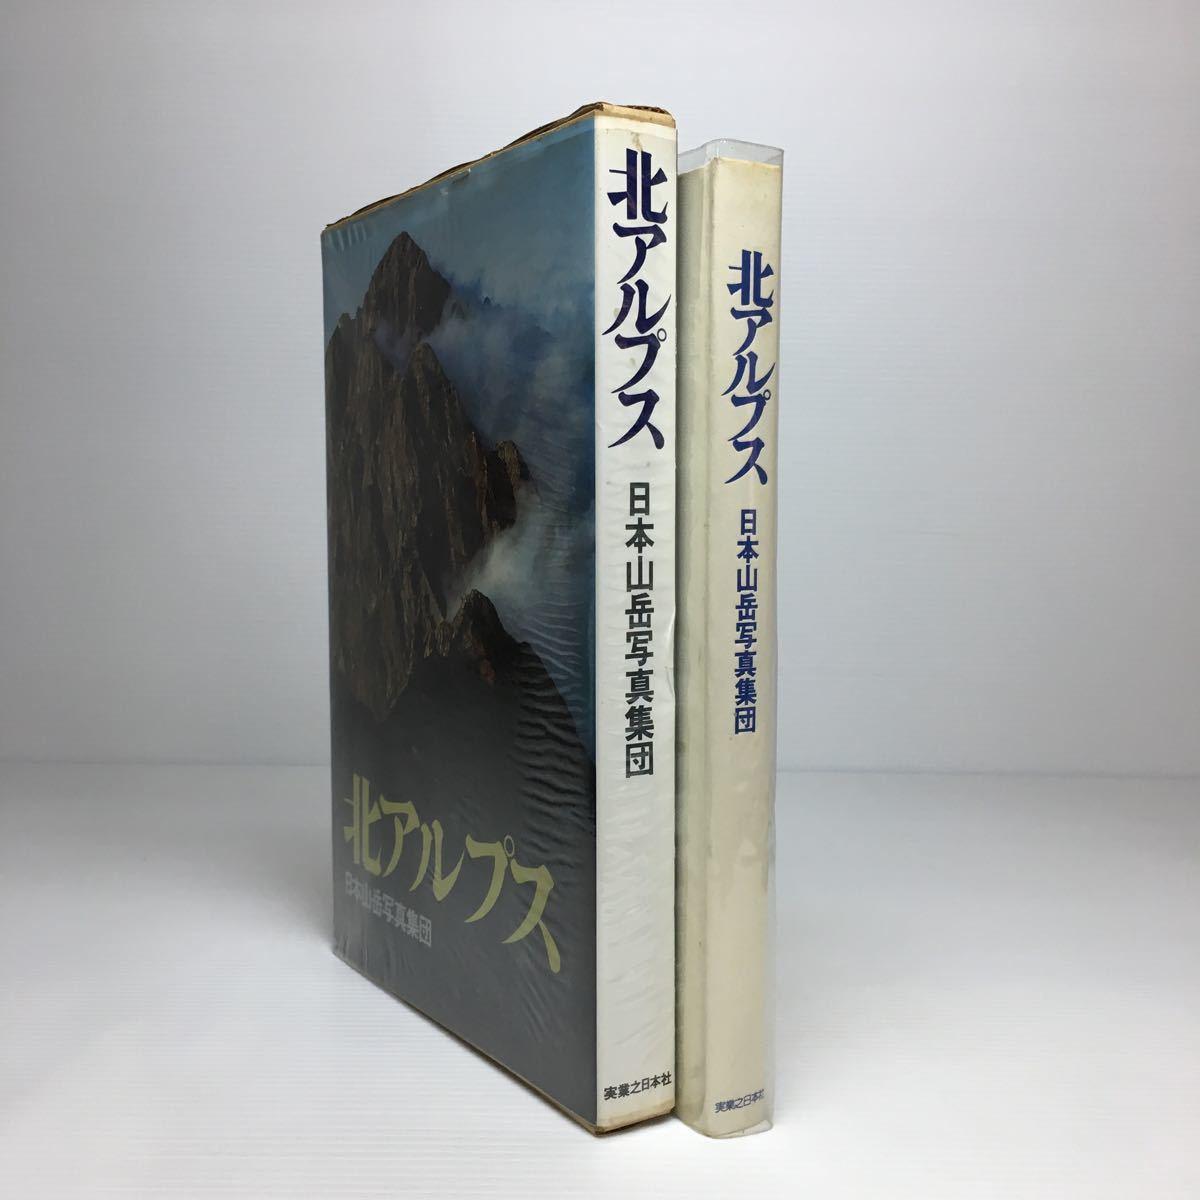 x2/北アルプス 日本山岳写真集団 昭和54年初版 定価8000円